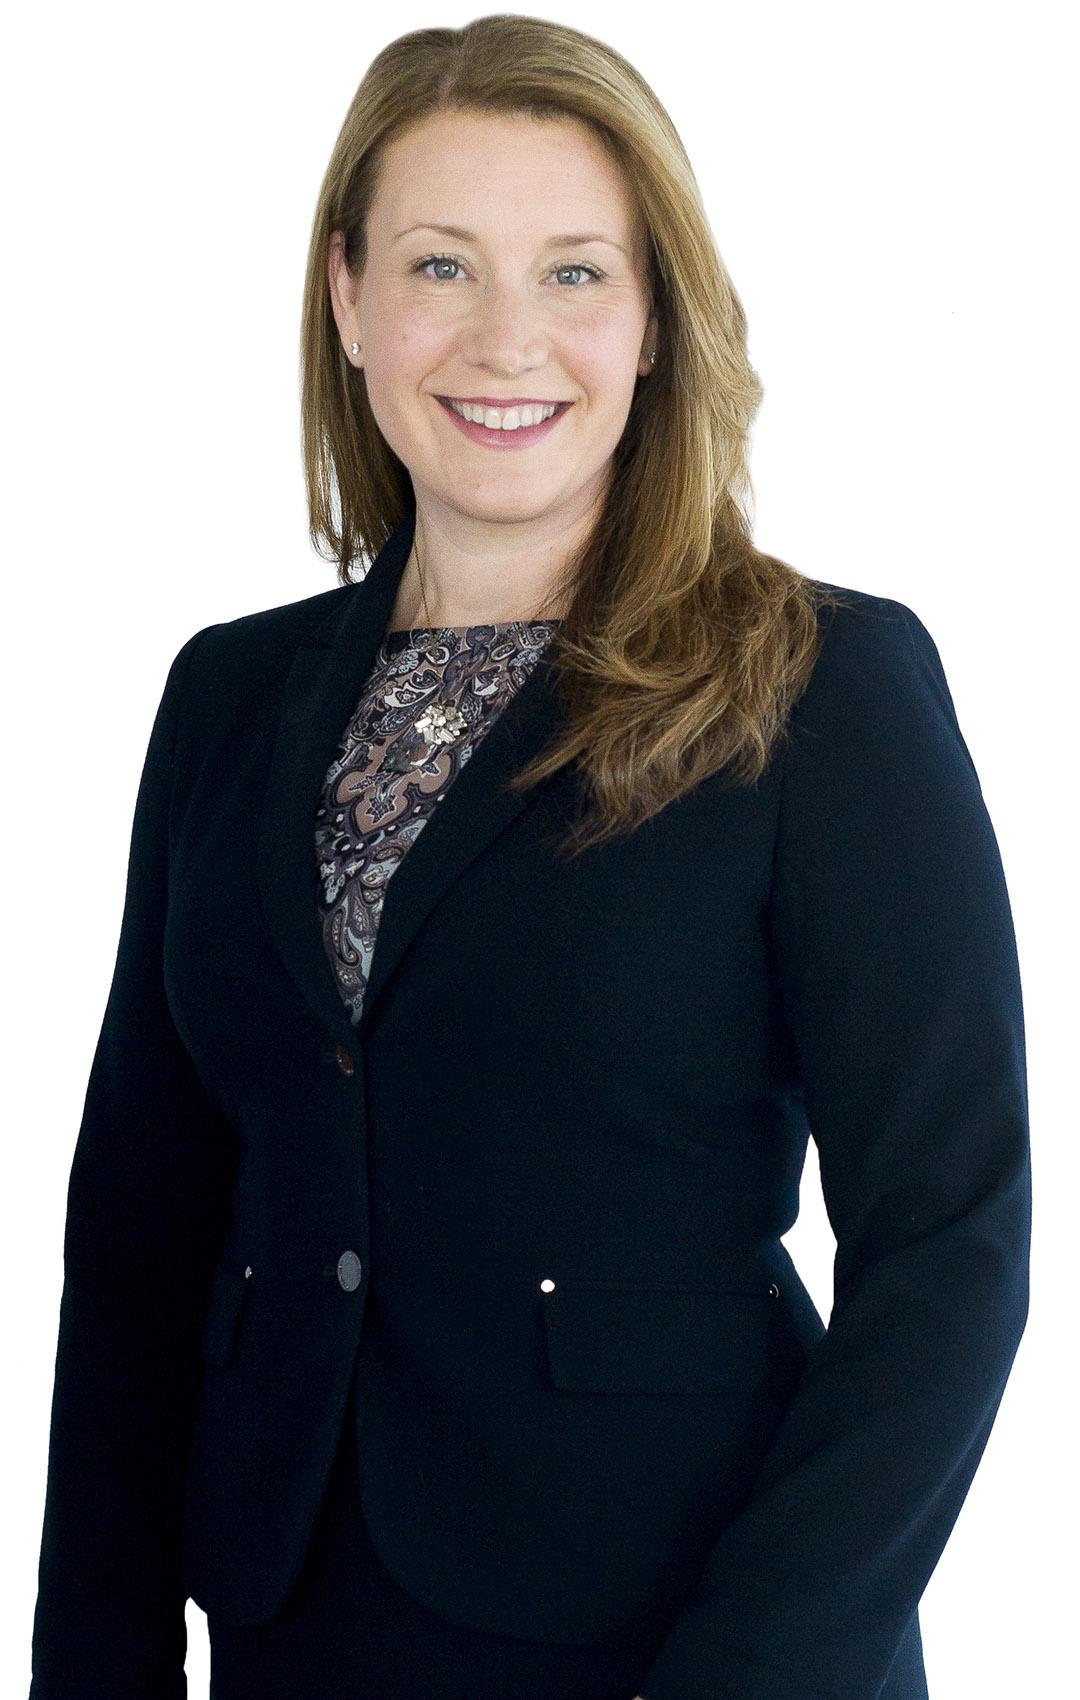 Kelly L. Whitehart